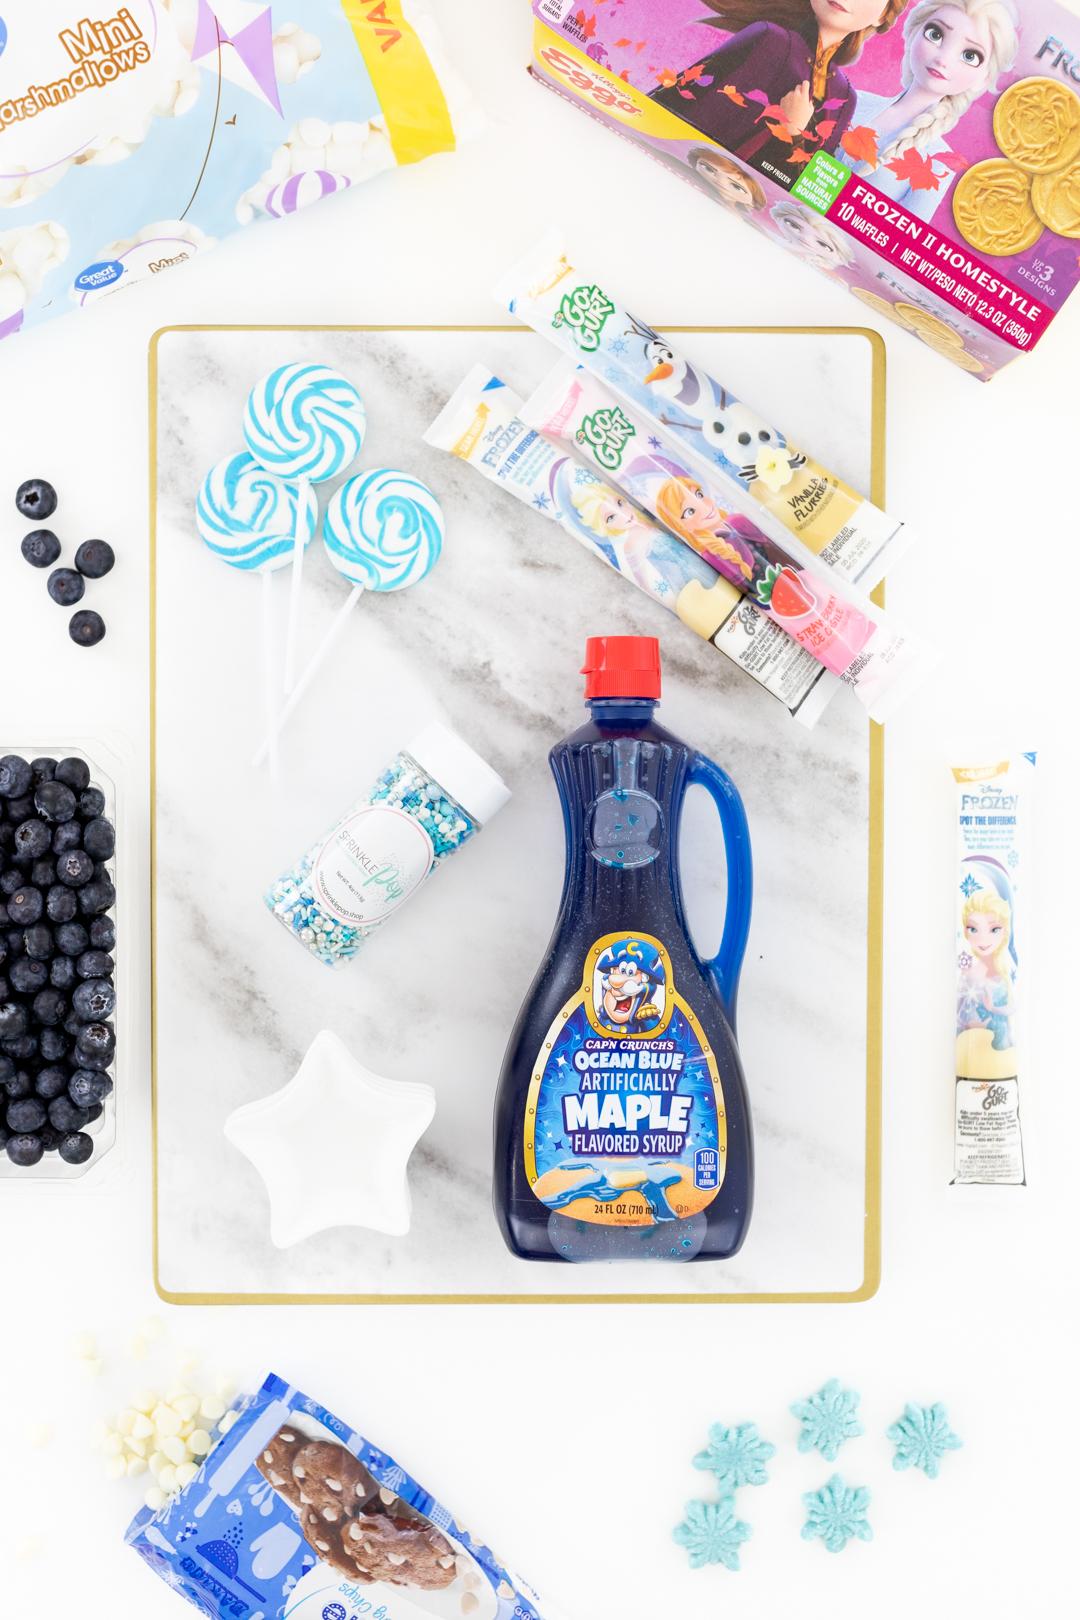 frozen movie waffle charcuterie items. Blue maple syrup, frozen movie gogurt, sprinkles, blueberries.